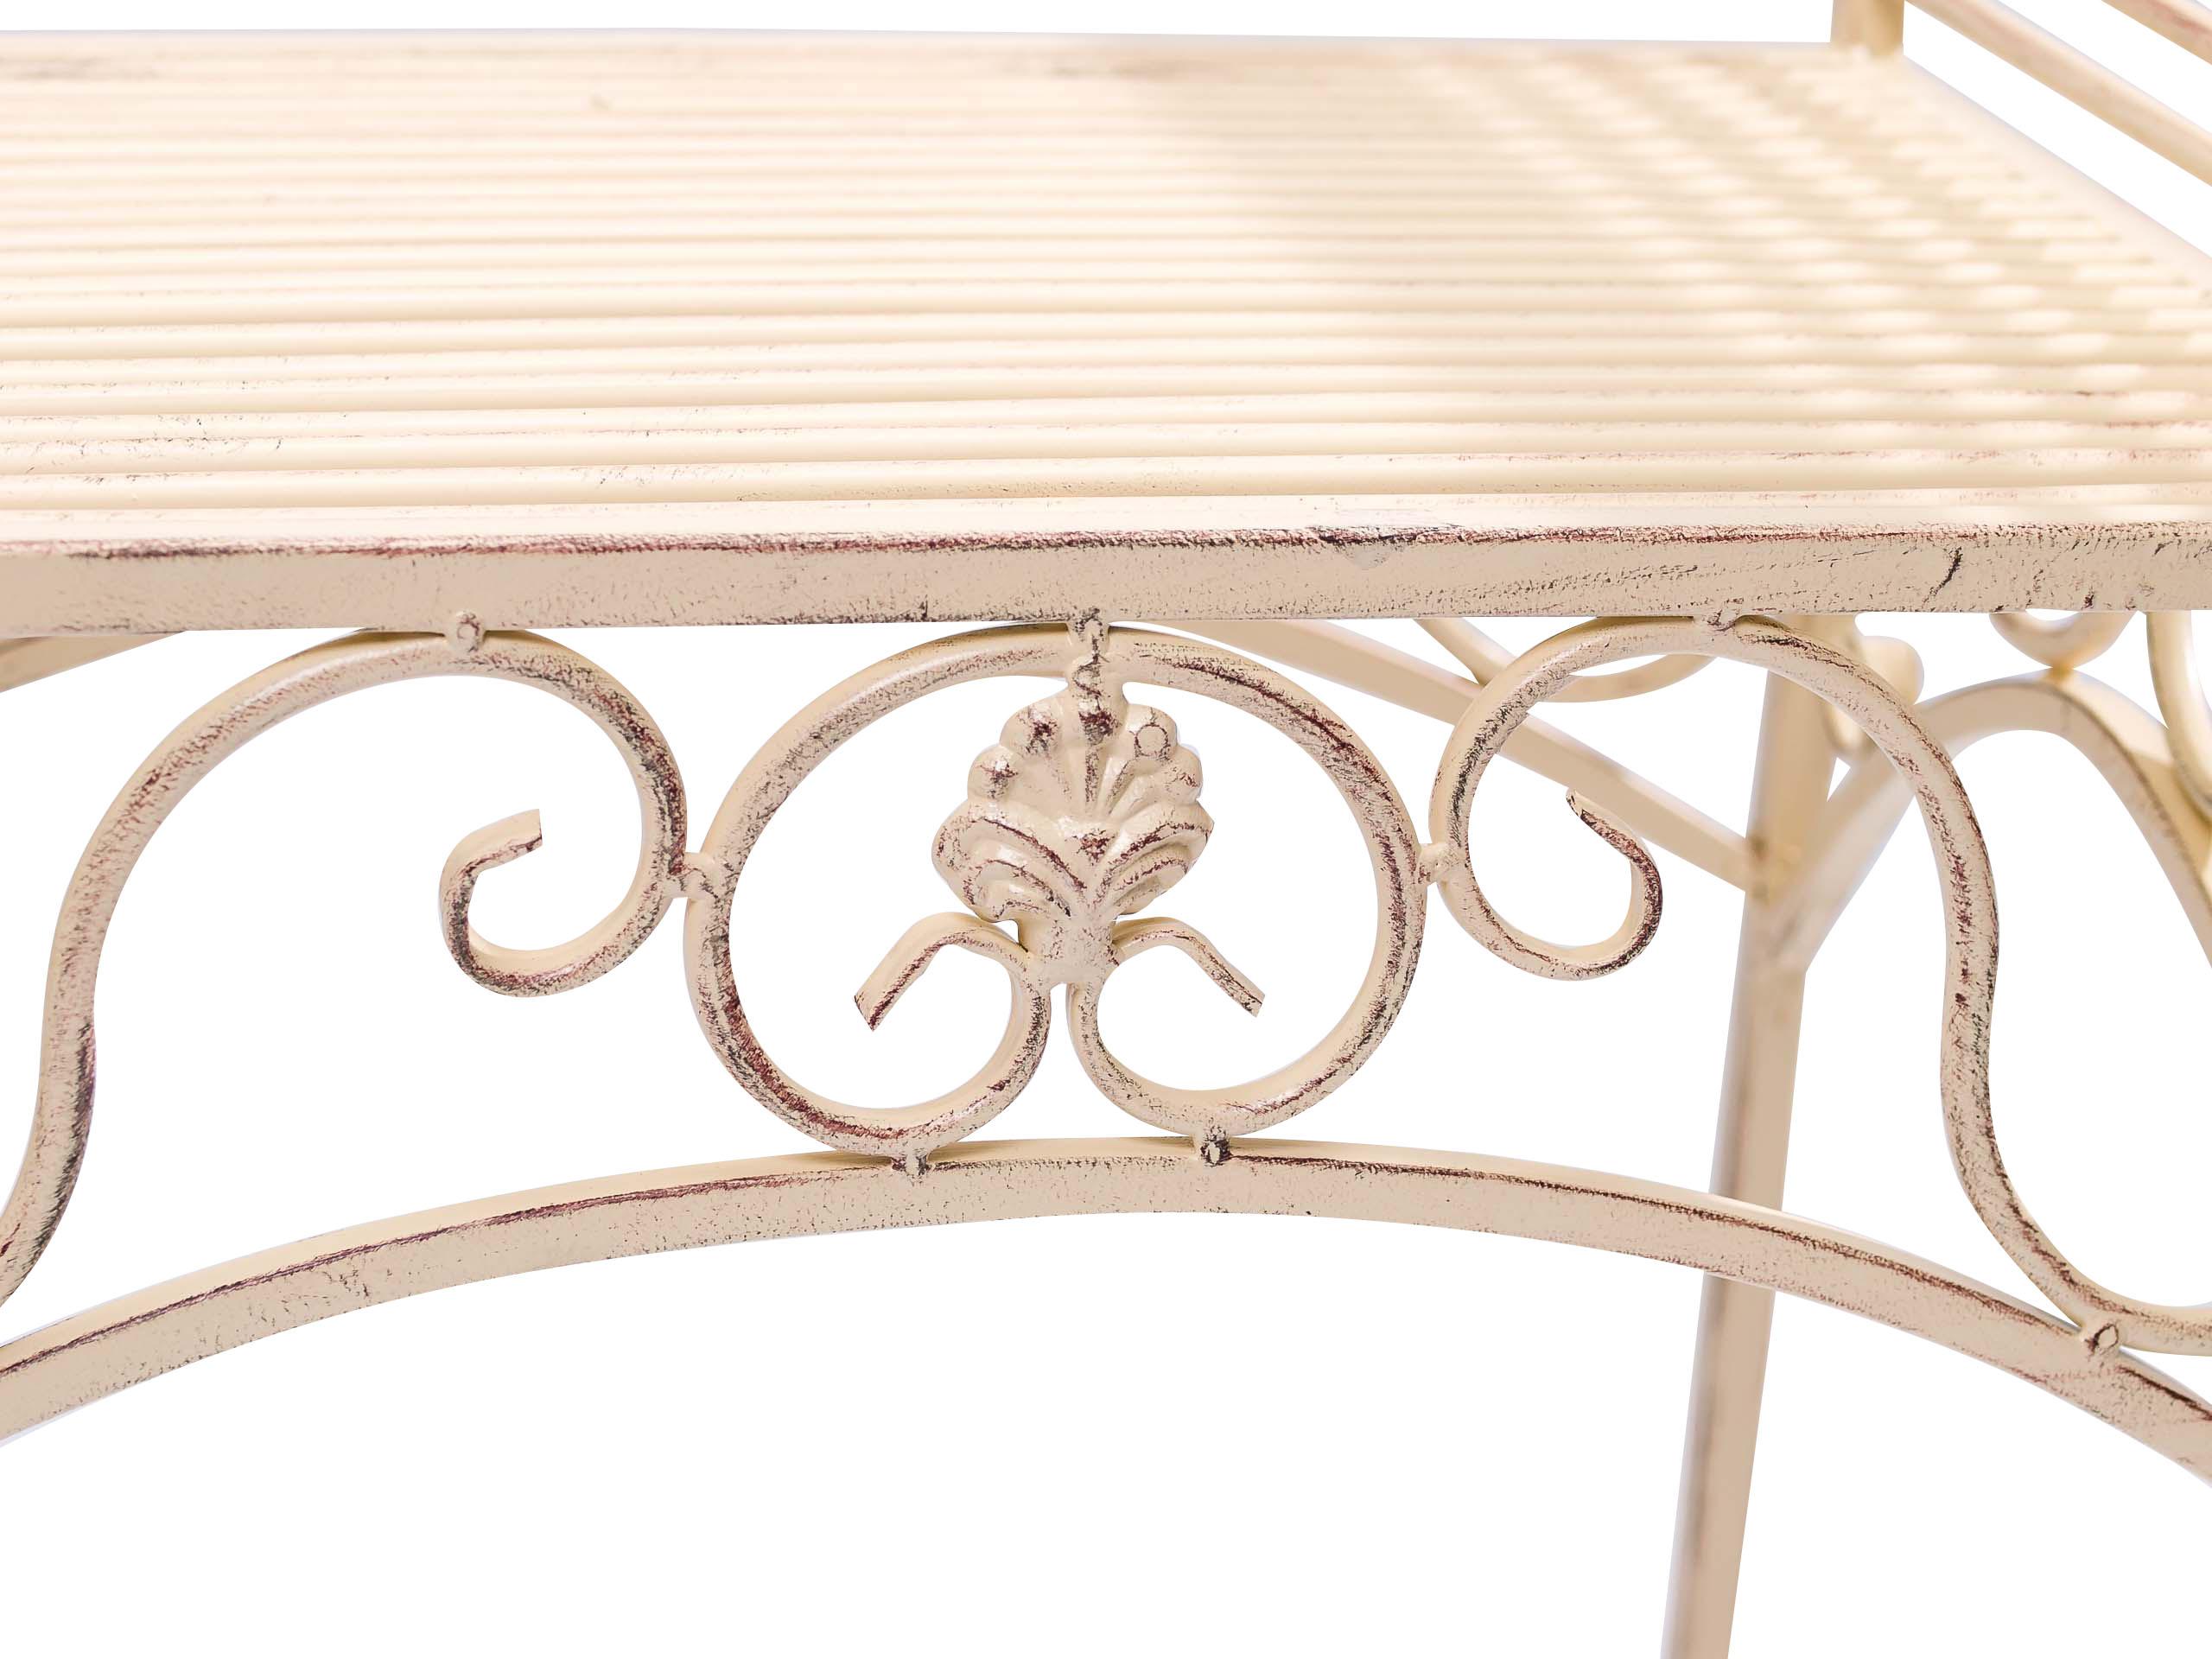 gartenbank eisen metall antik stil garten bank gartenm bel. Black Bedroom Furniture Sets. Home Design Ideas